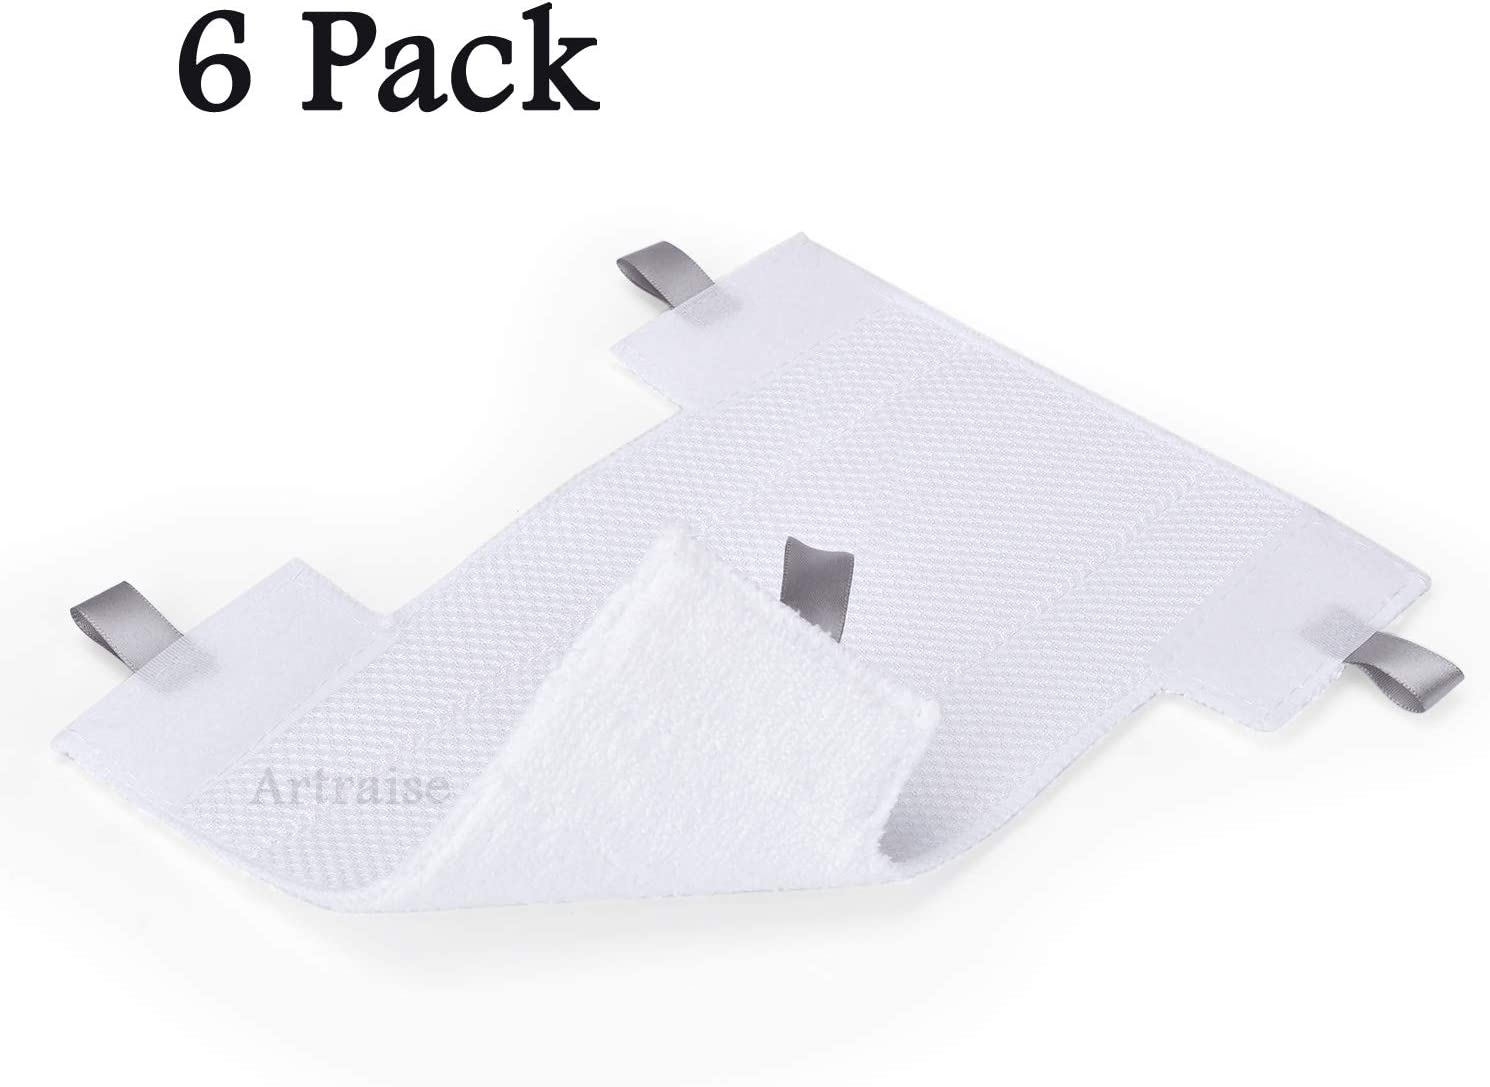 6Pack Dust-Away Micro-Fiber Hv300 Series Pads kit for Shark Dust-Away, Rotator, Navigator Lift-Away Pro Vacuum, Ultra Light Stick Vacuum